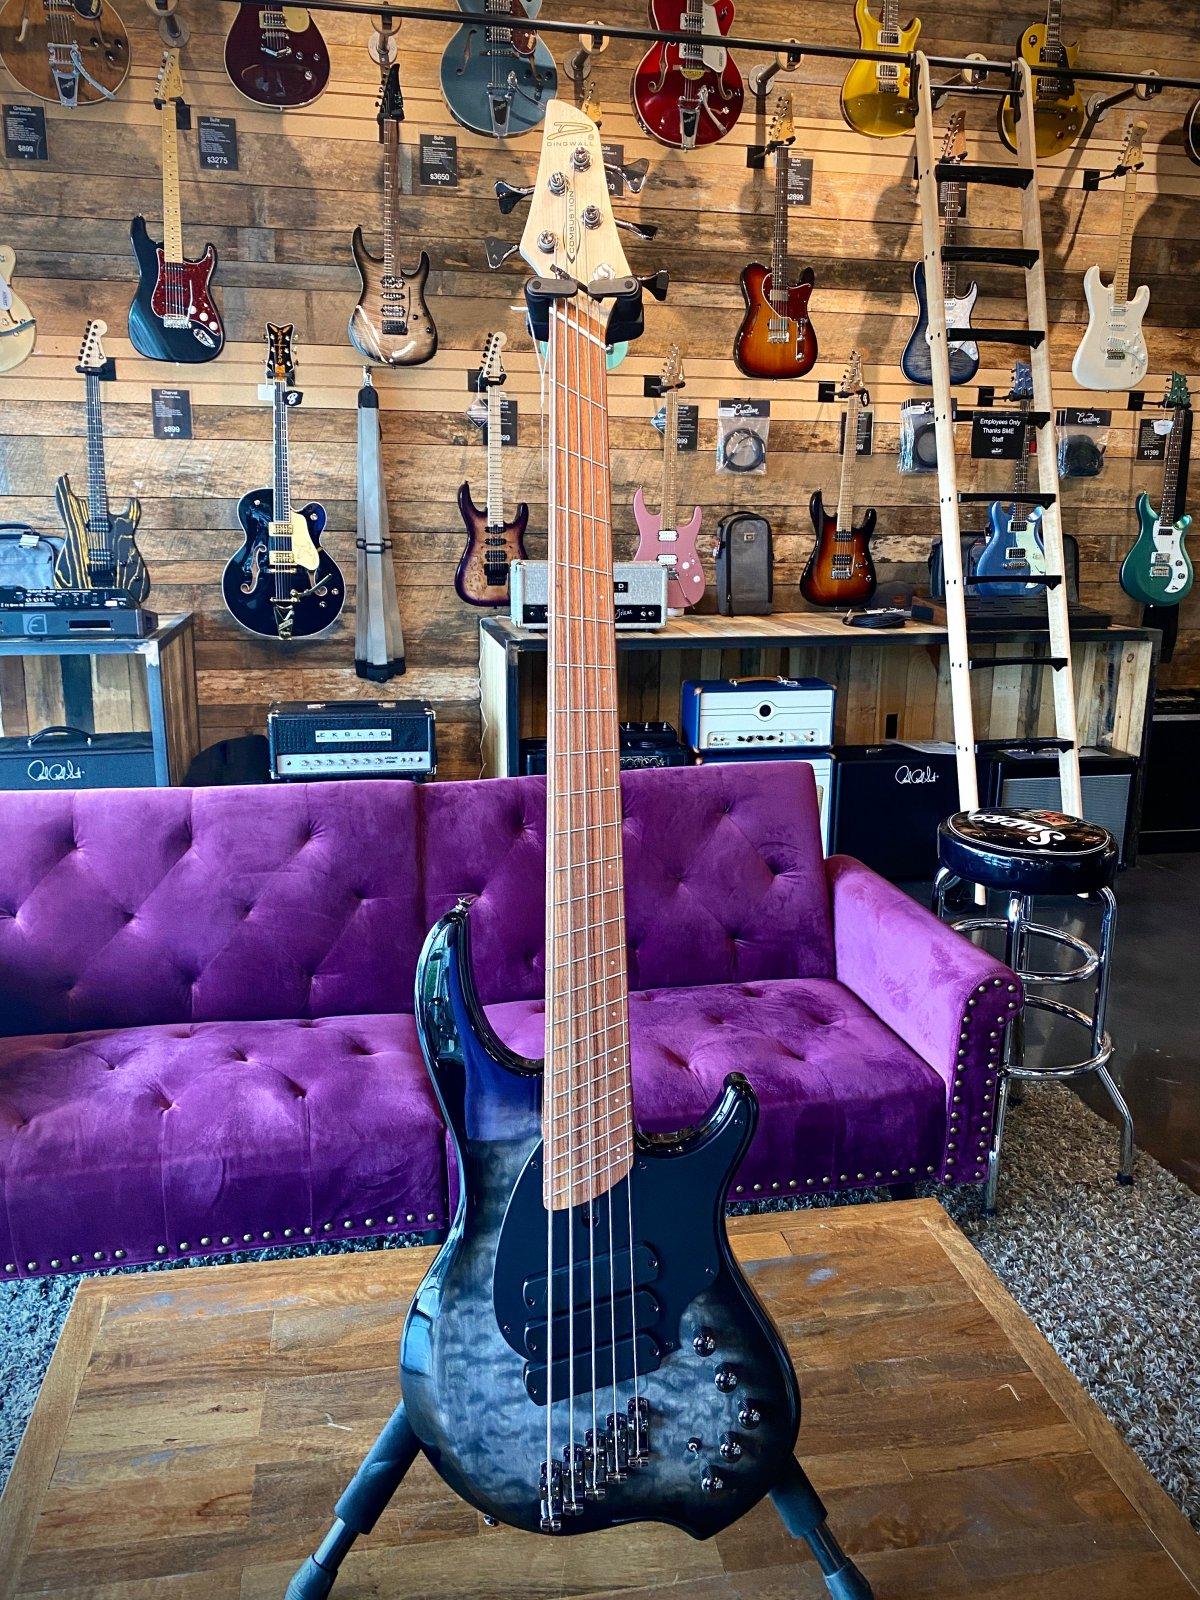 Dingwall Combustion 5-String Bass in Blackburst Finish